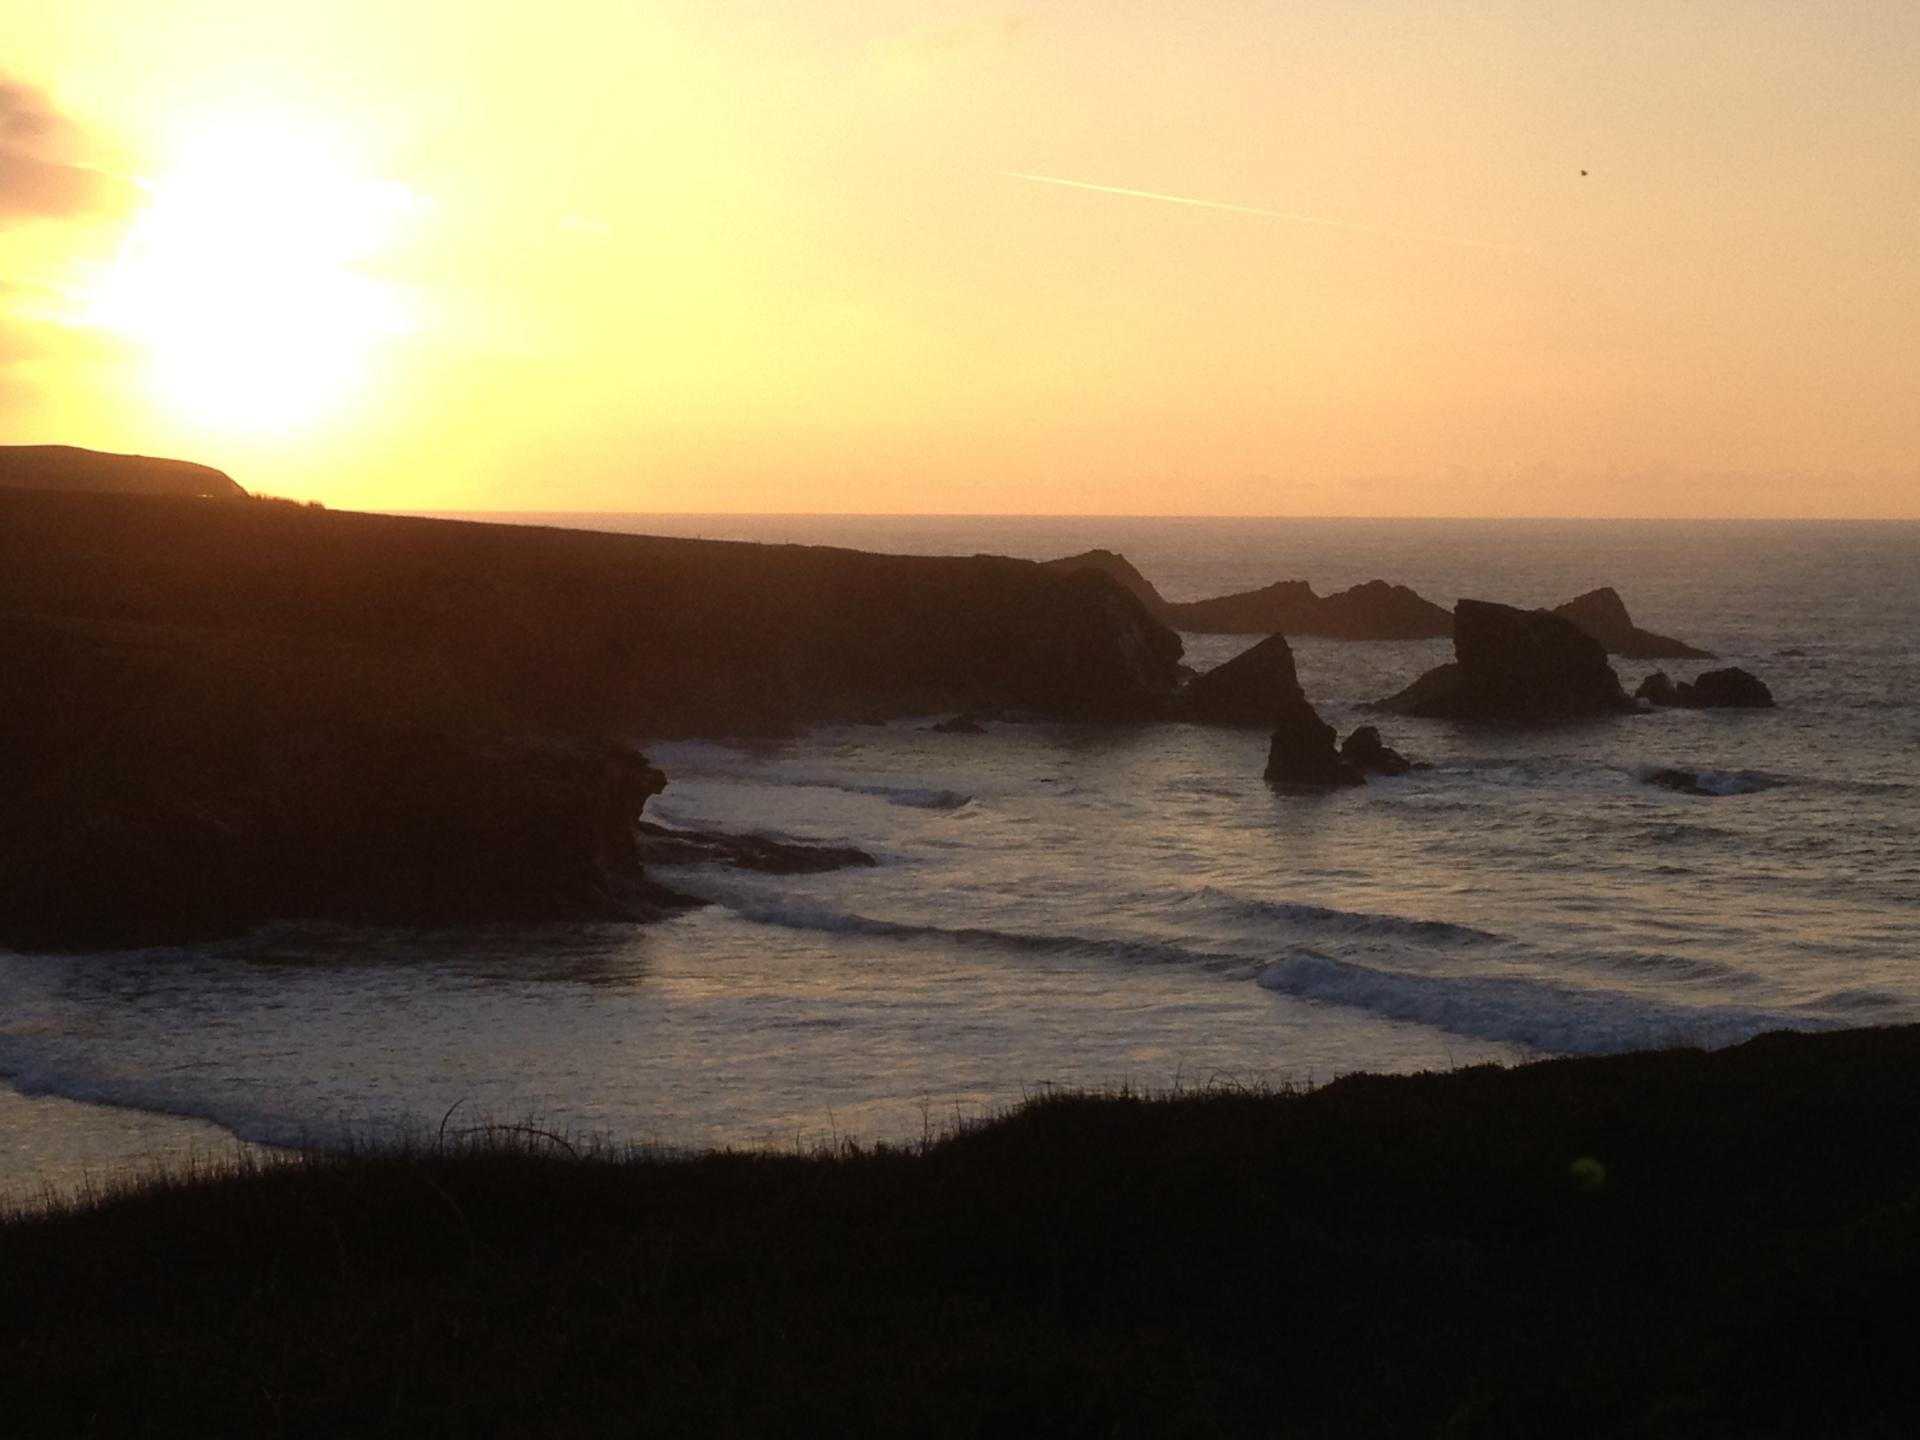 Portthcothan sunset